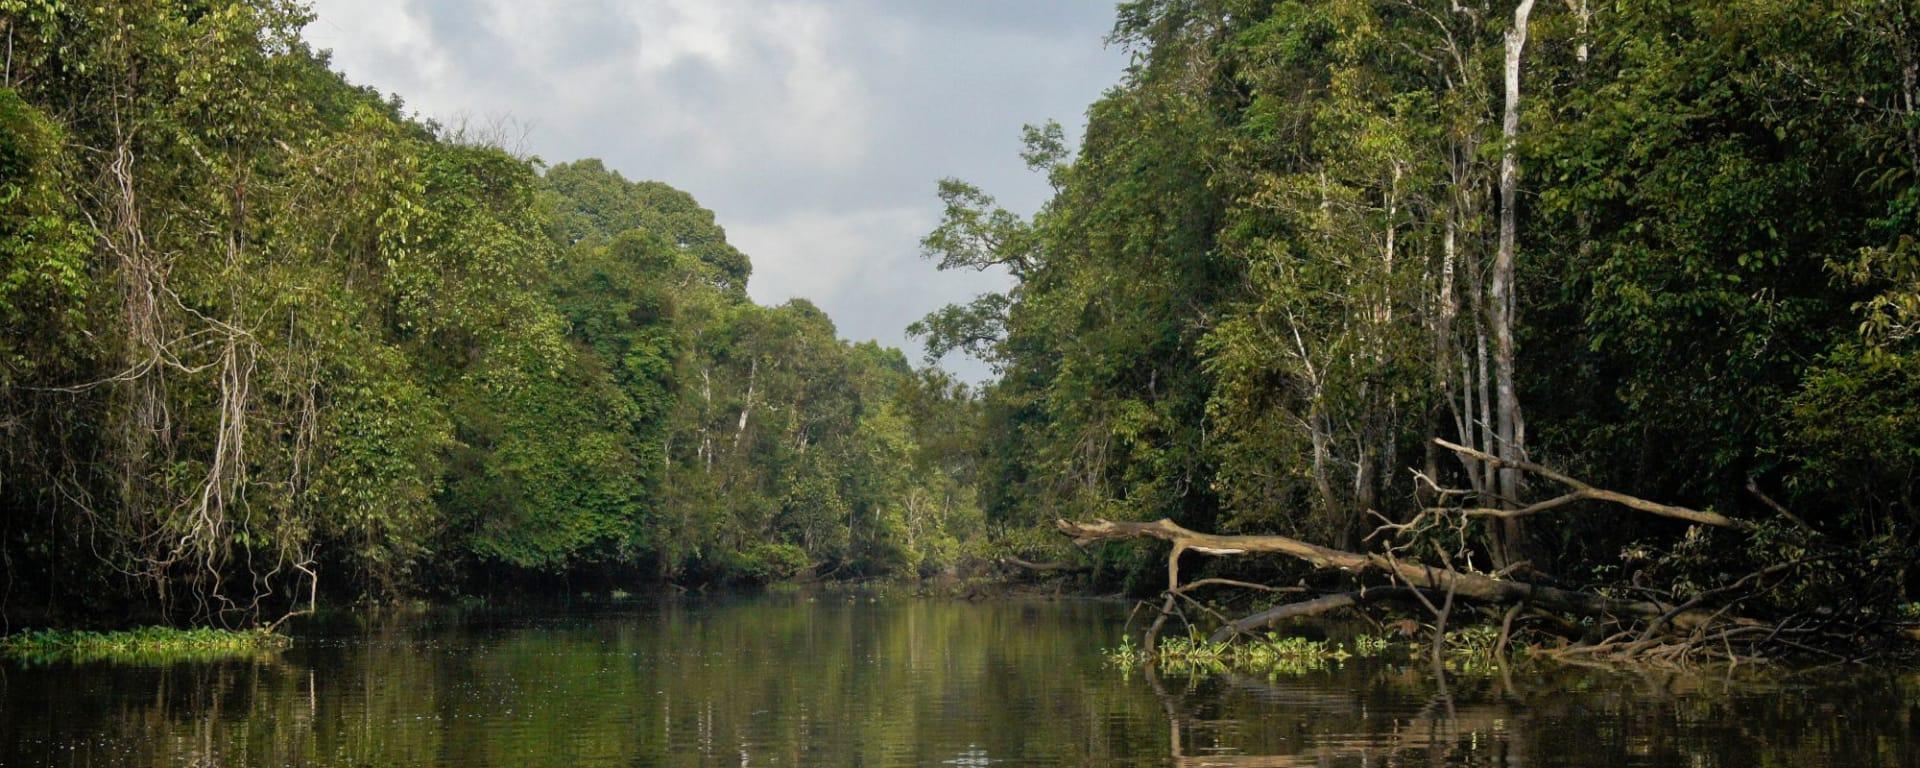 Vie sauvage de Bornéo / Borneo Rainforest Lodge de Kota Kinabalu: Kinabatangan River